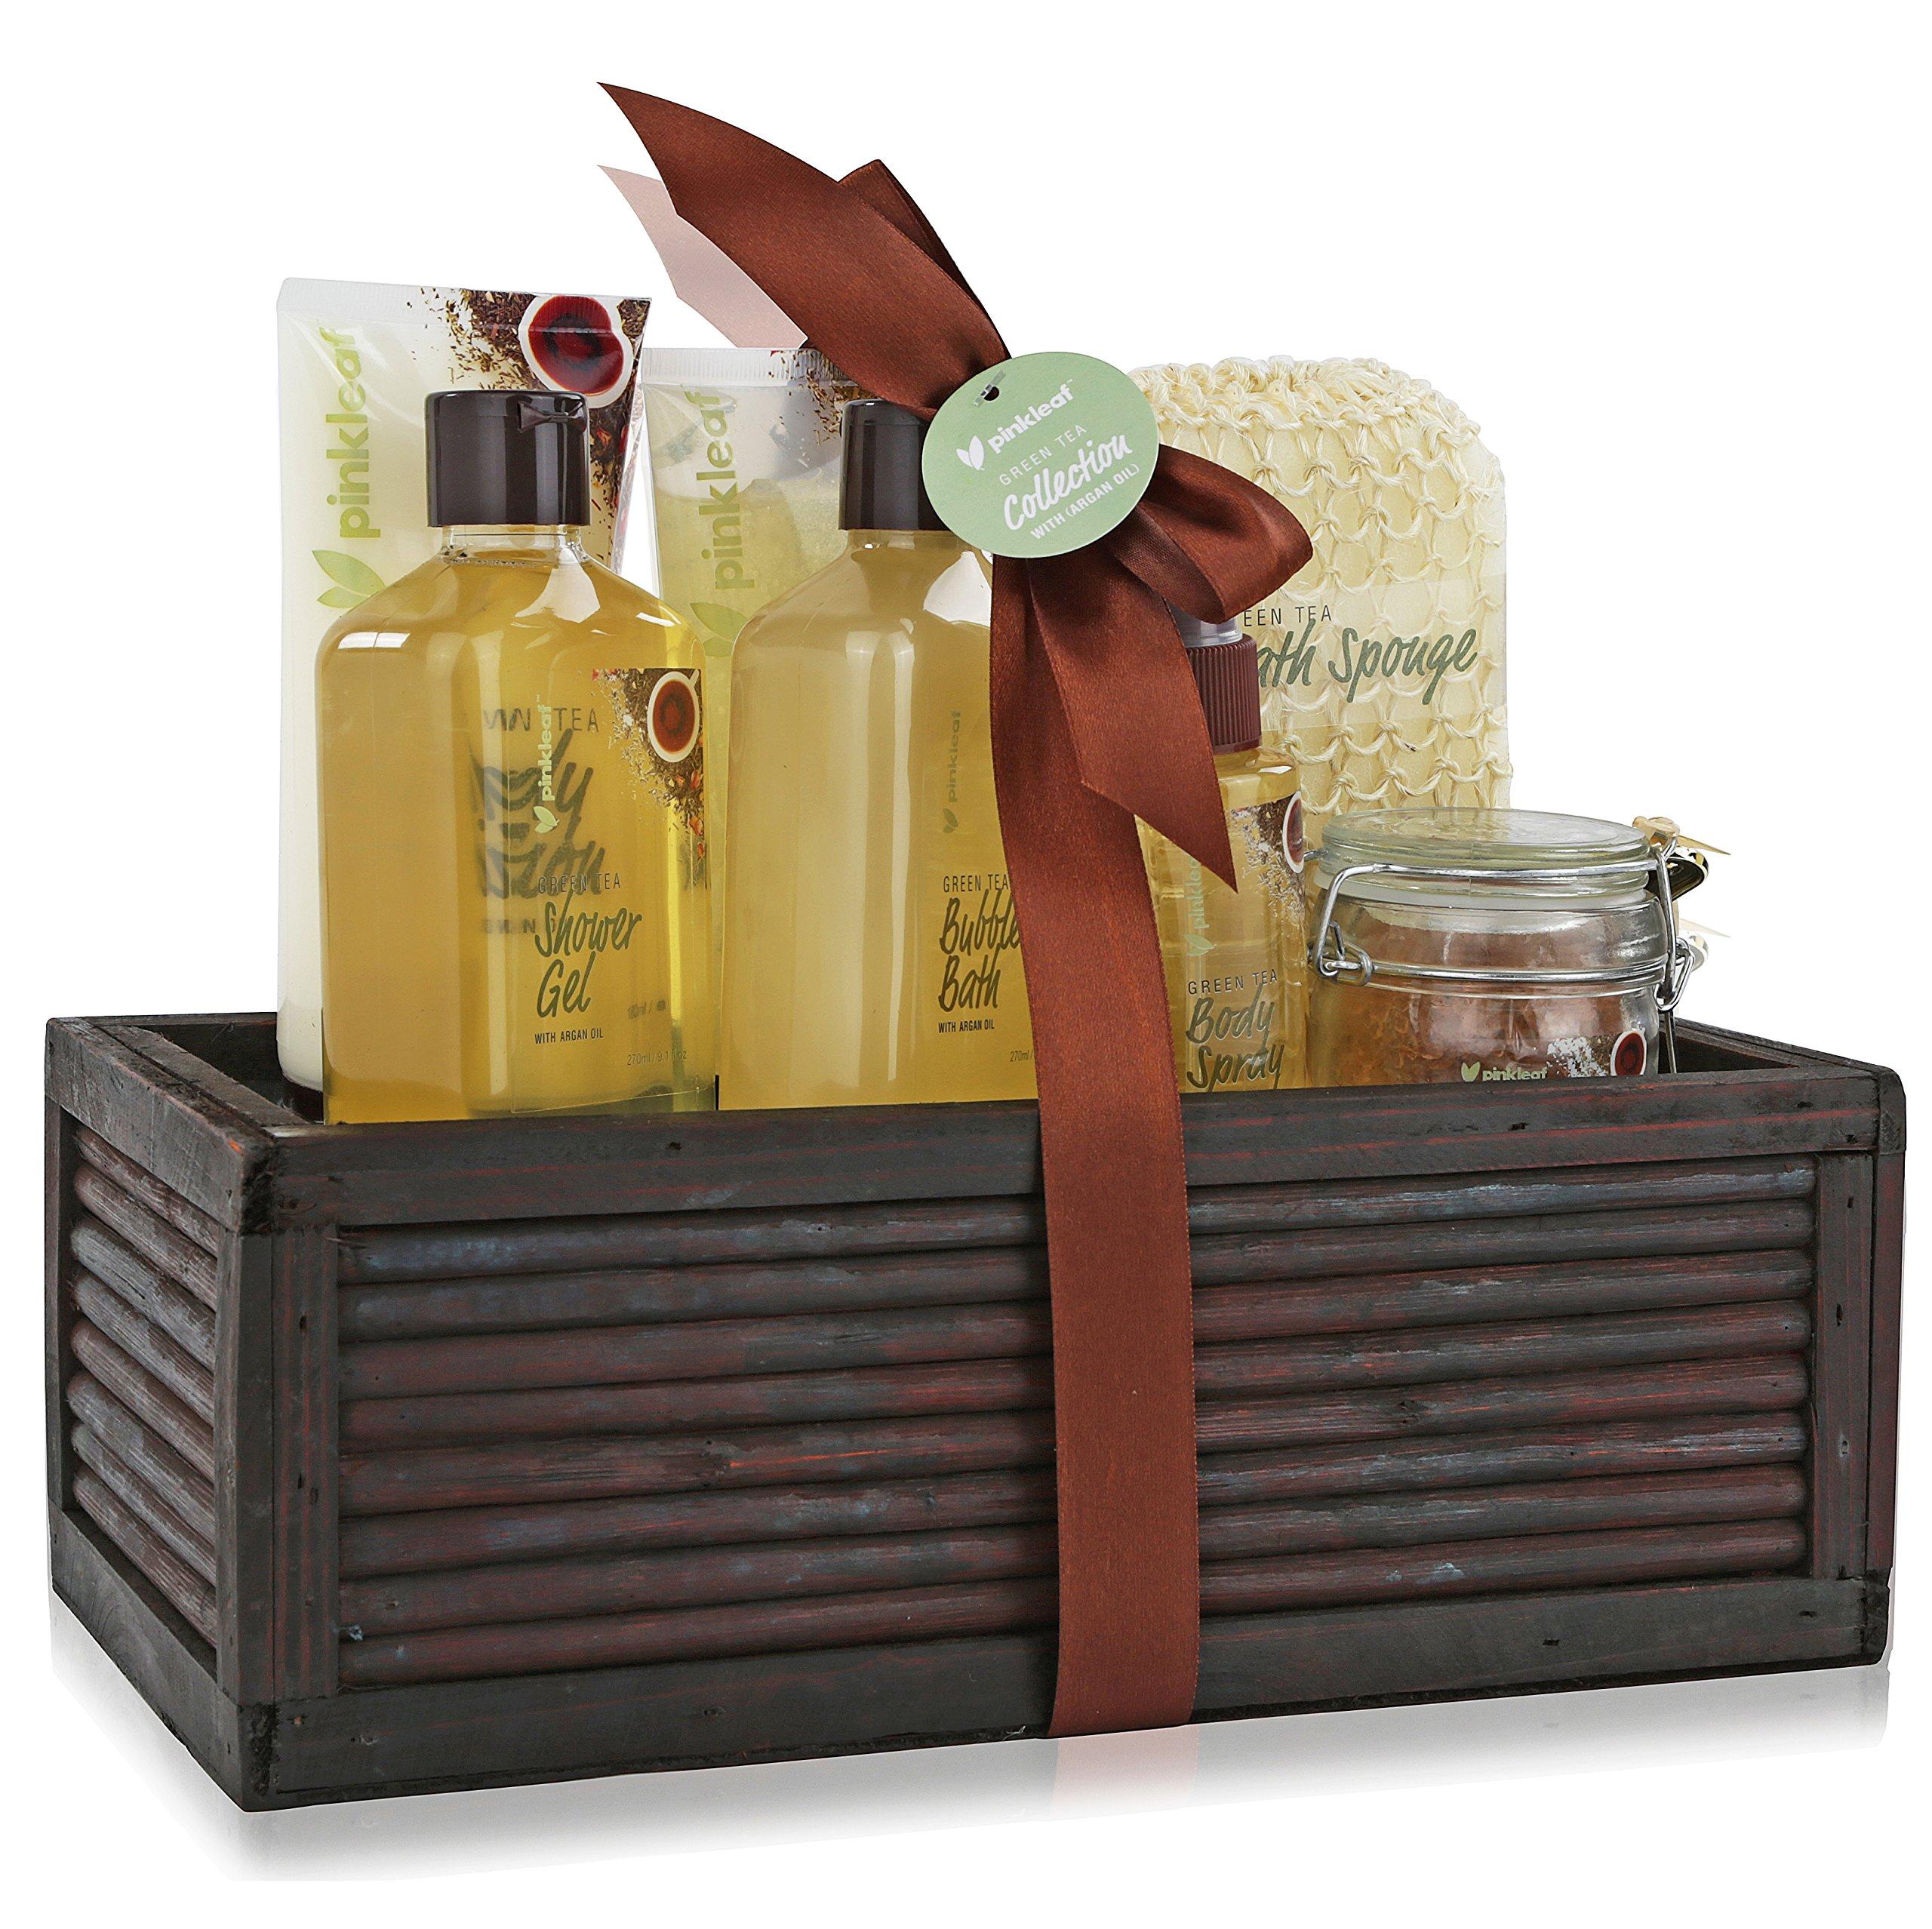 Amazon.com : VERDUGO GIFT CO Warm Vanilla Spa Basket : Home Decor ...